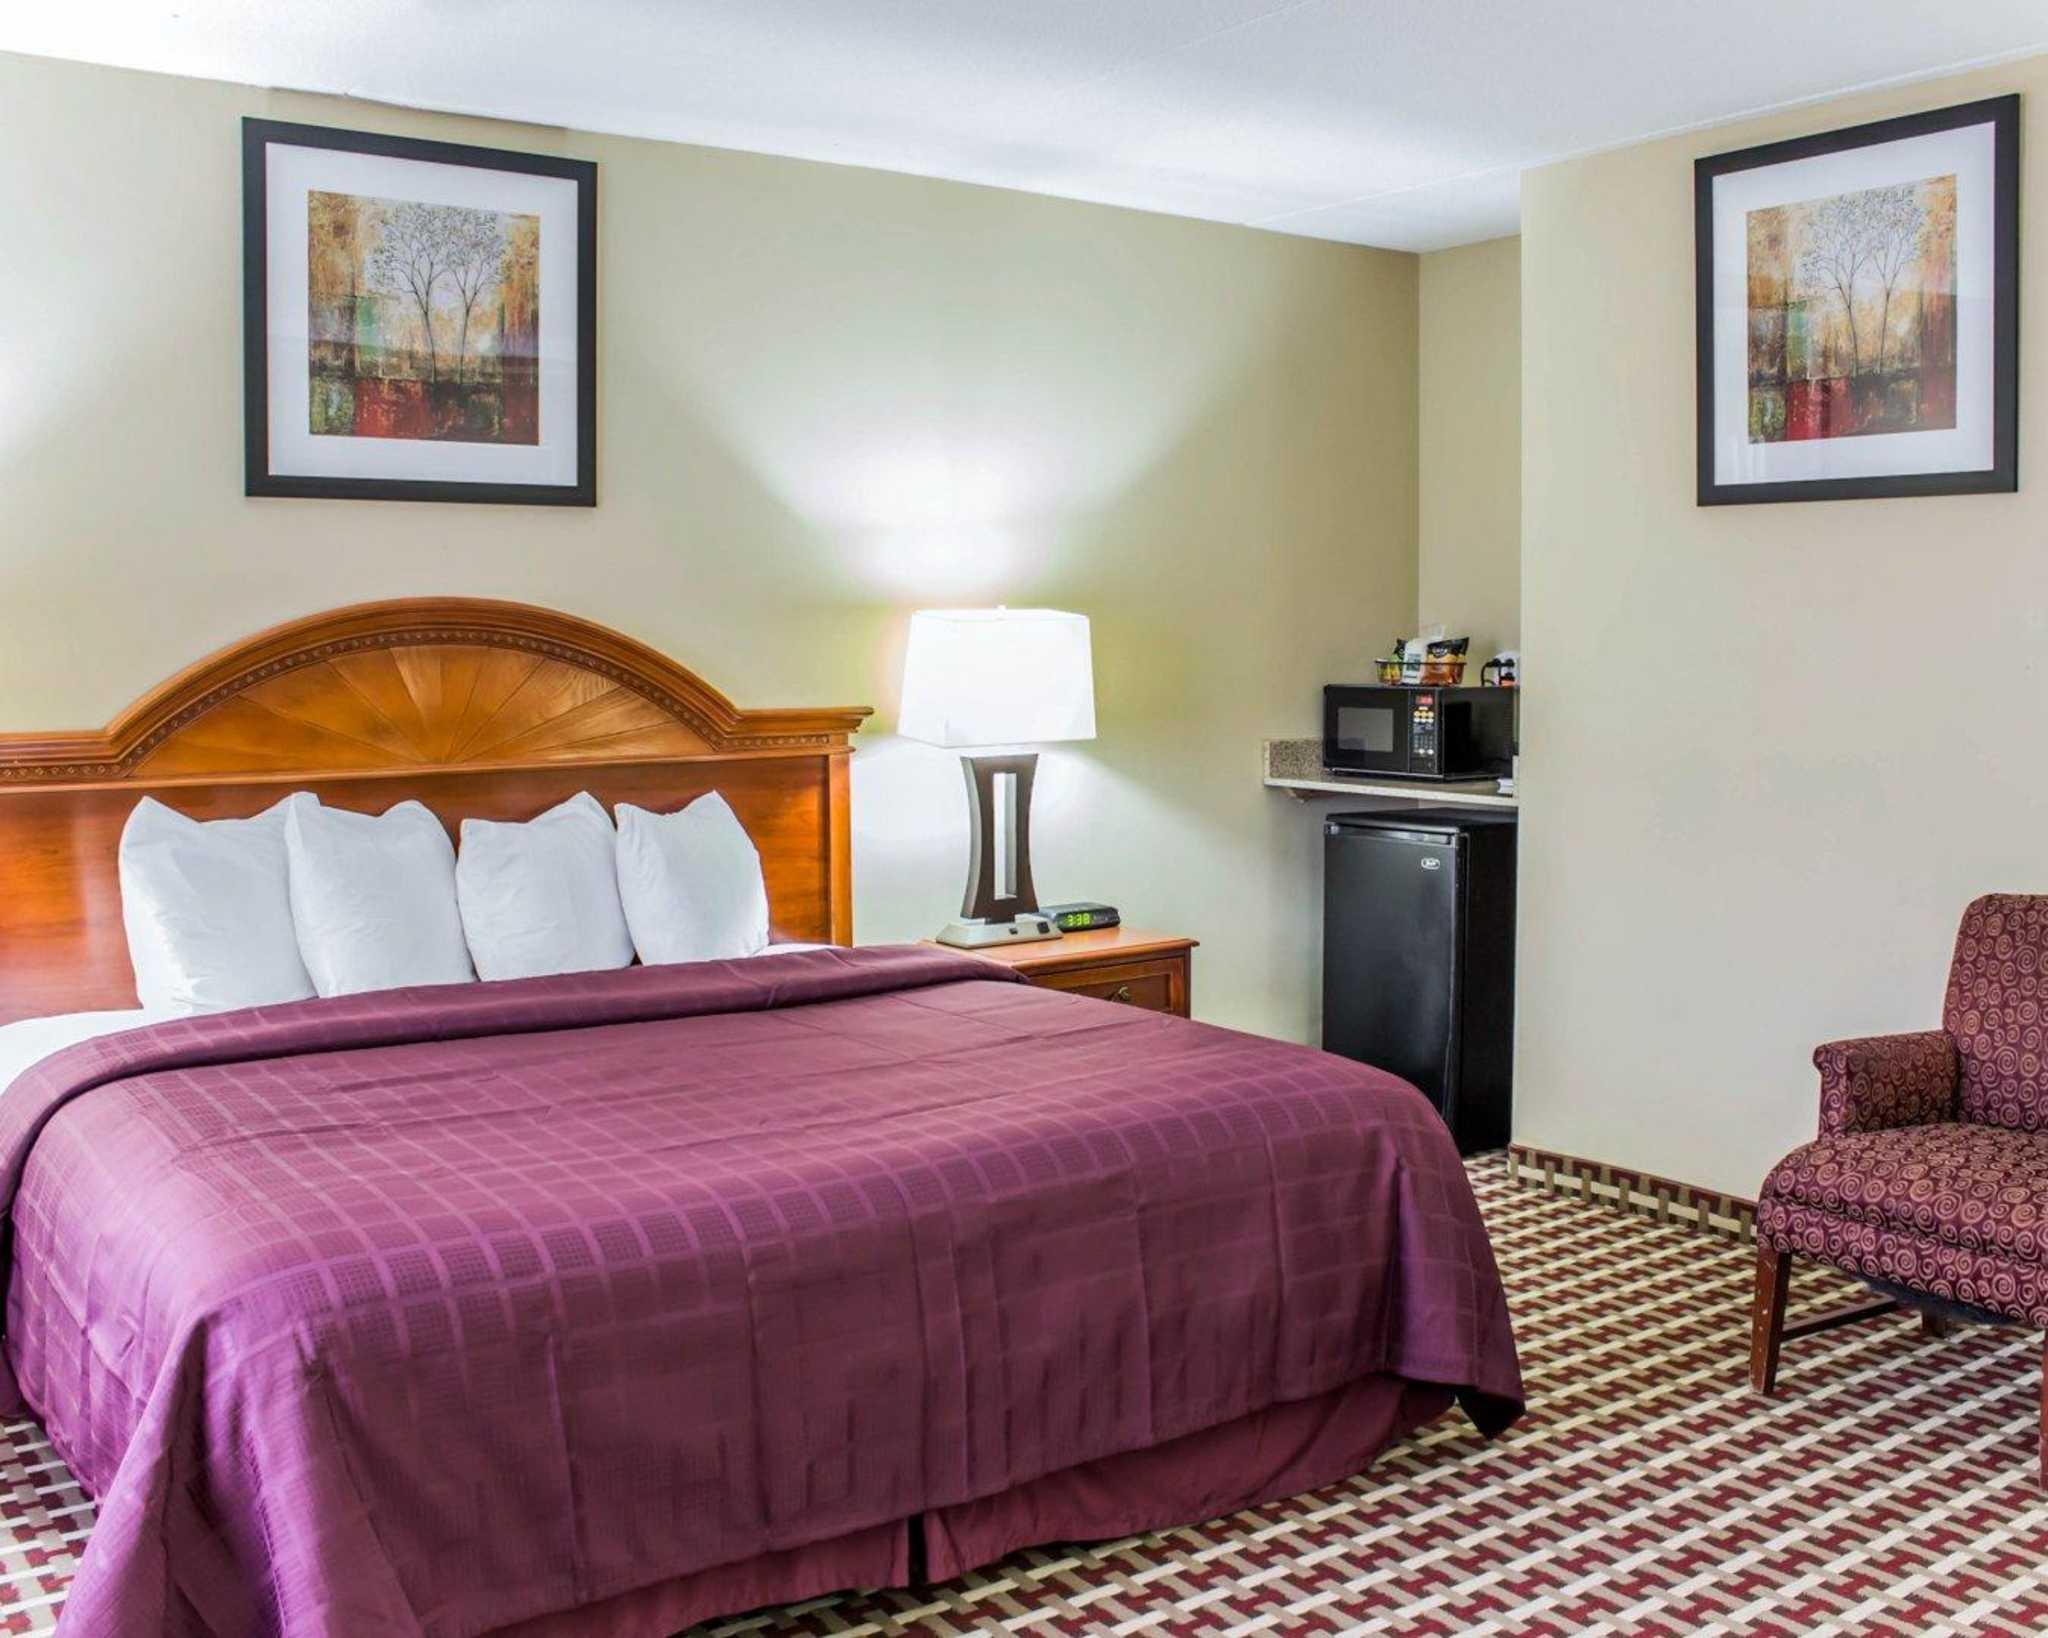 Quality Inn & Suites Fort Bragg image 17